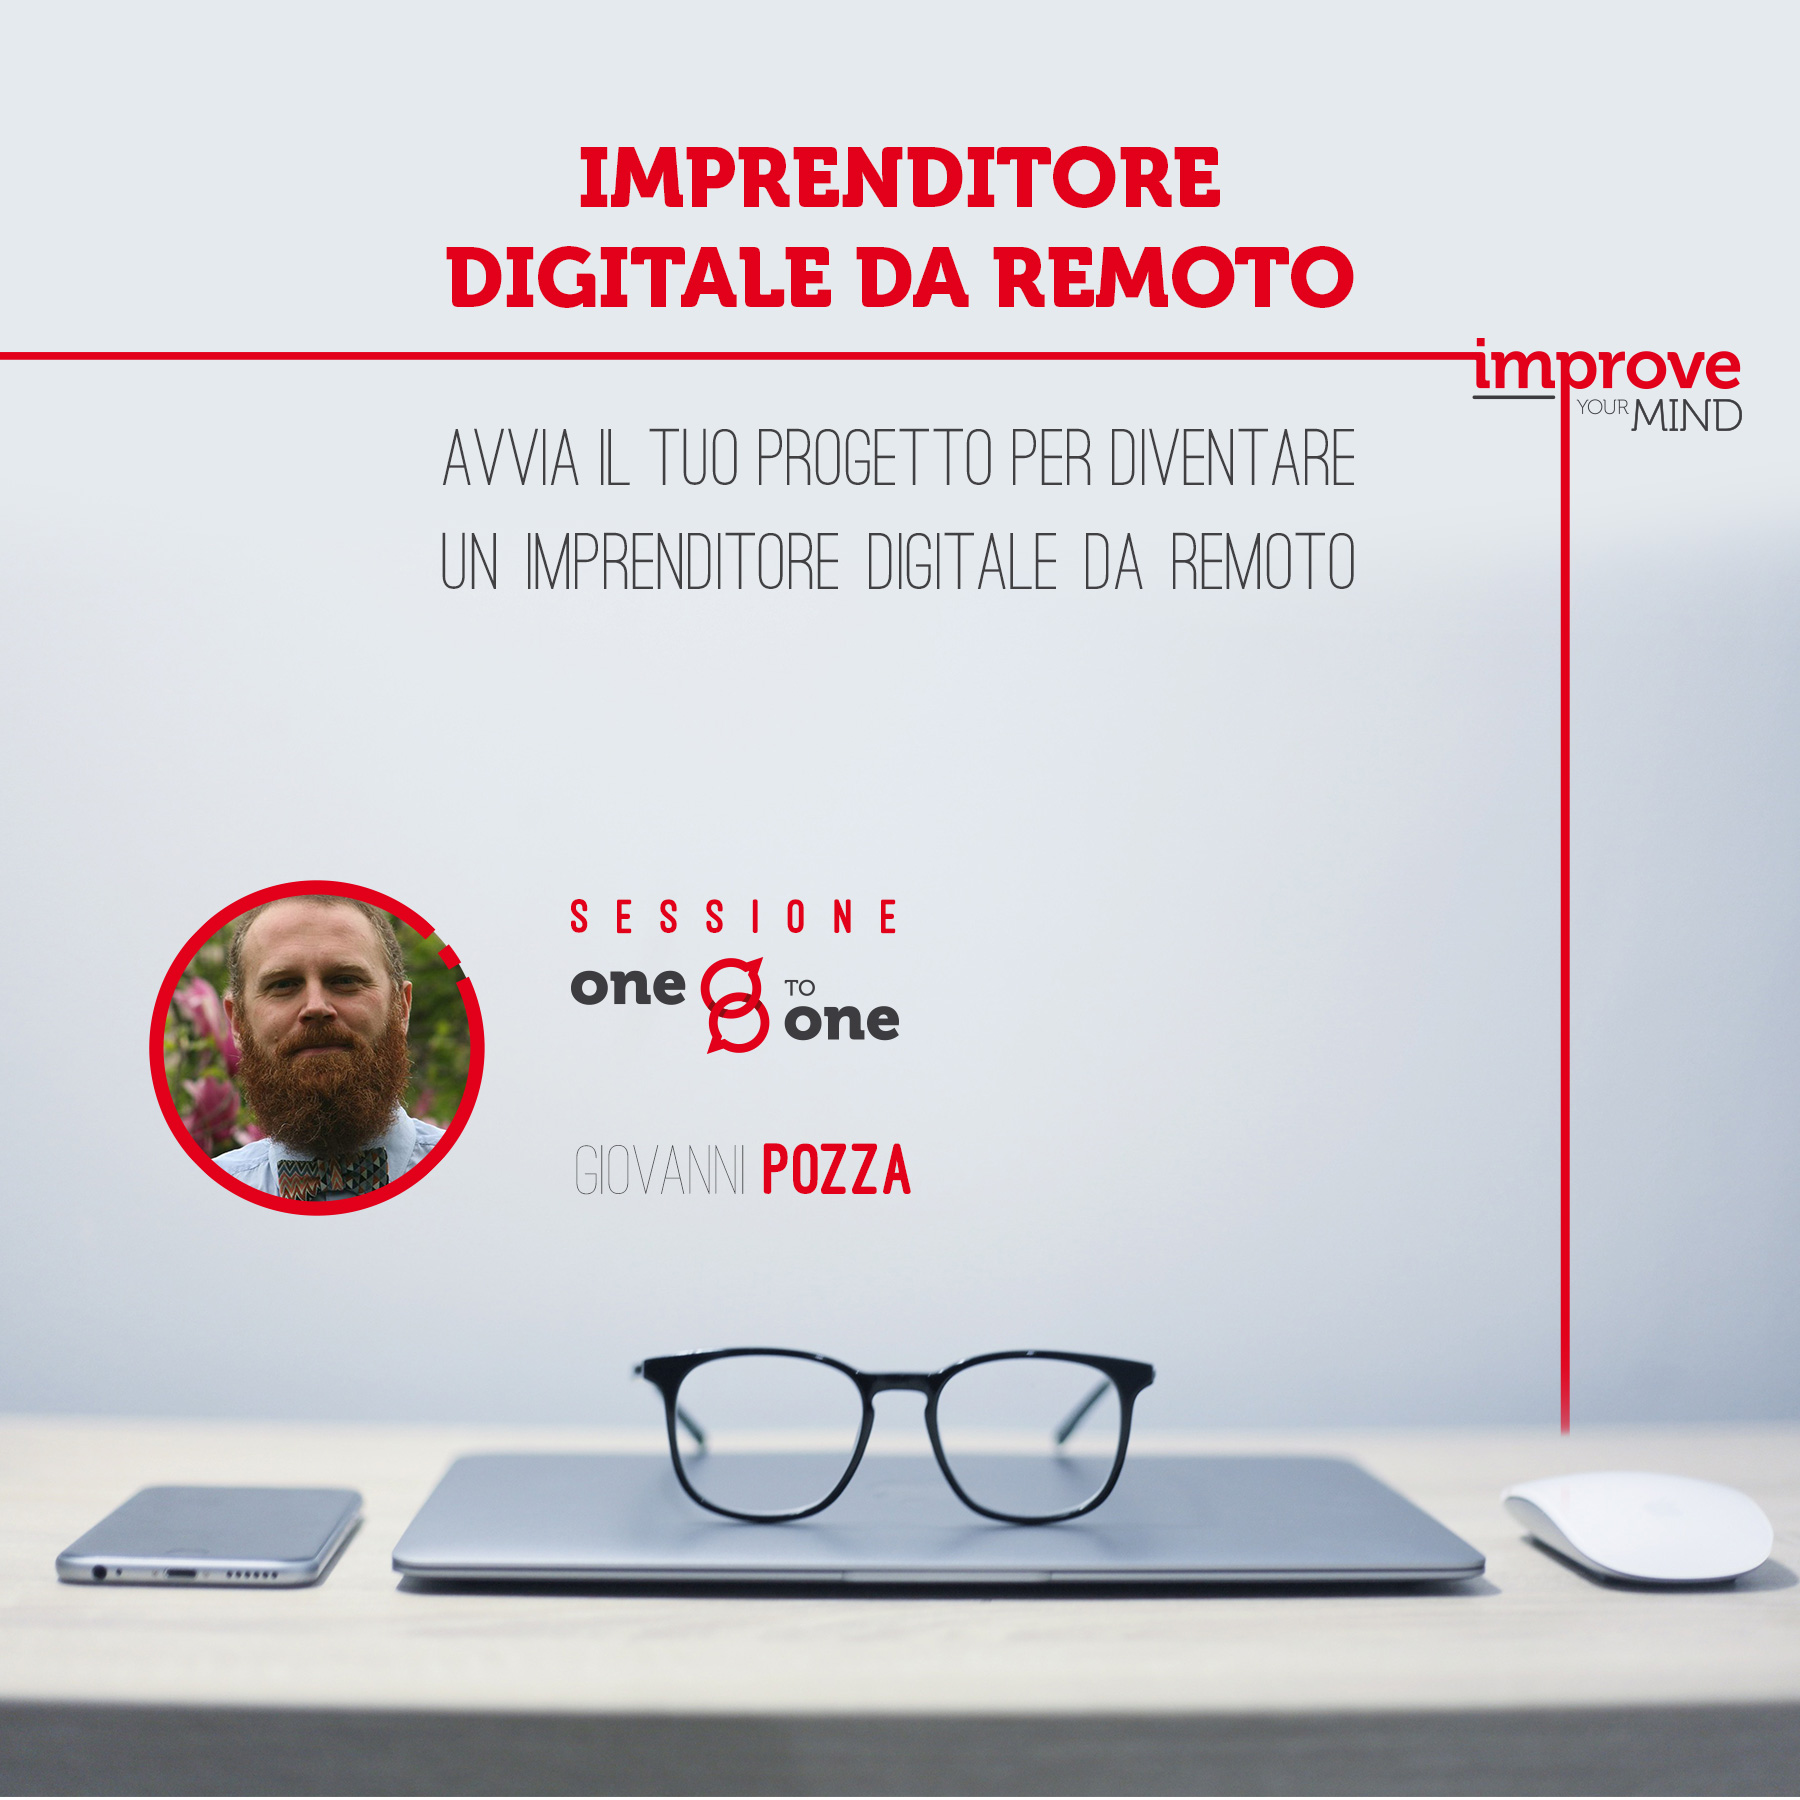 Diventa Imprenditore Digitale da Remoto